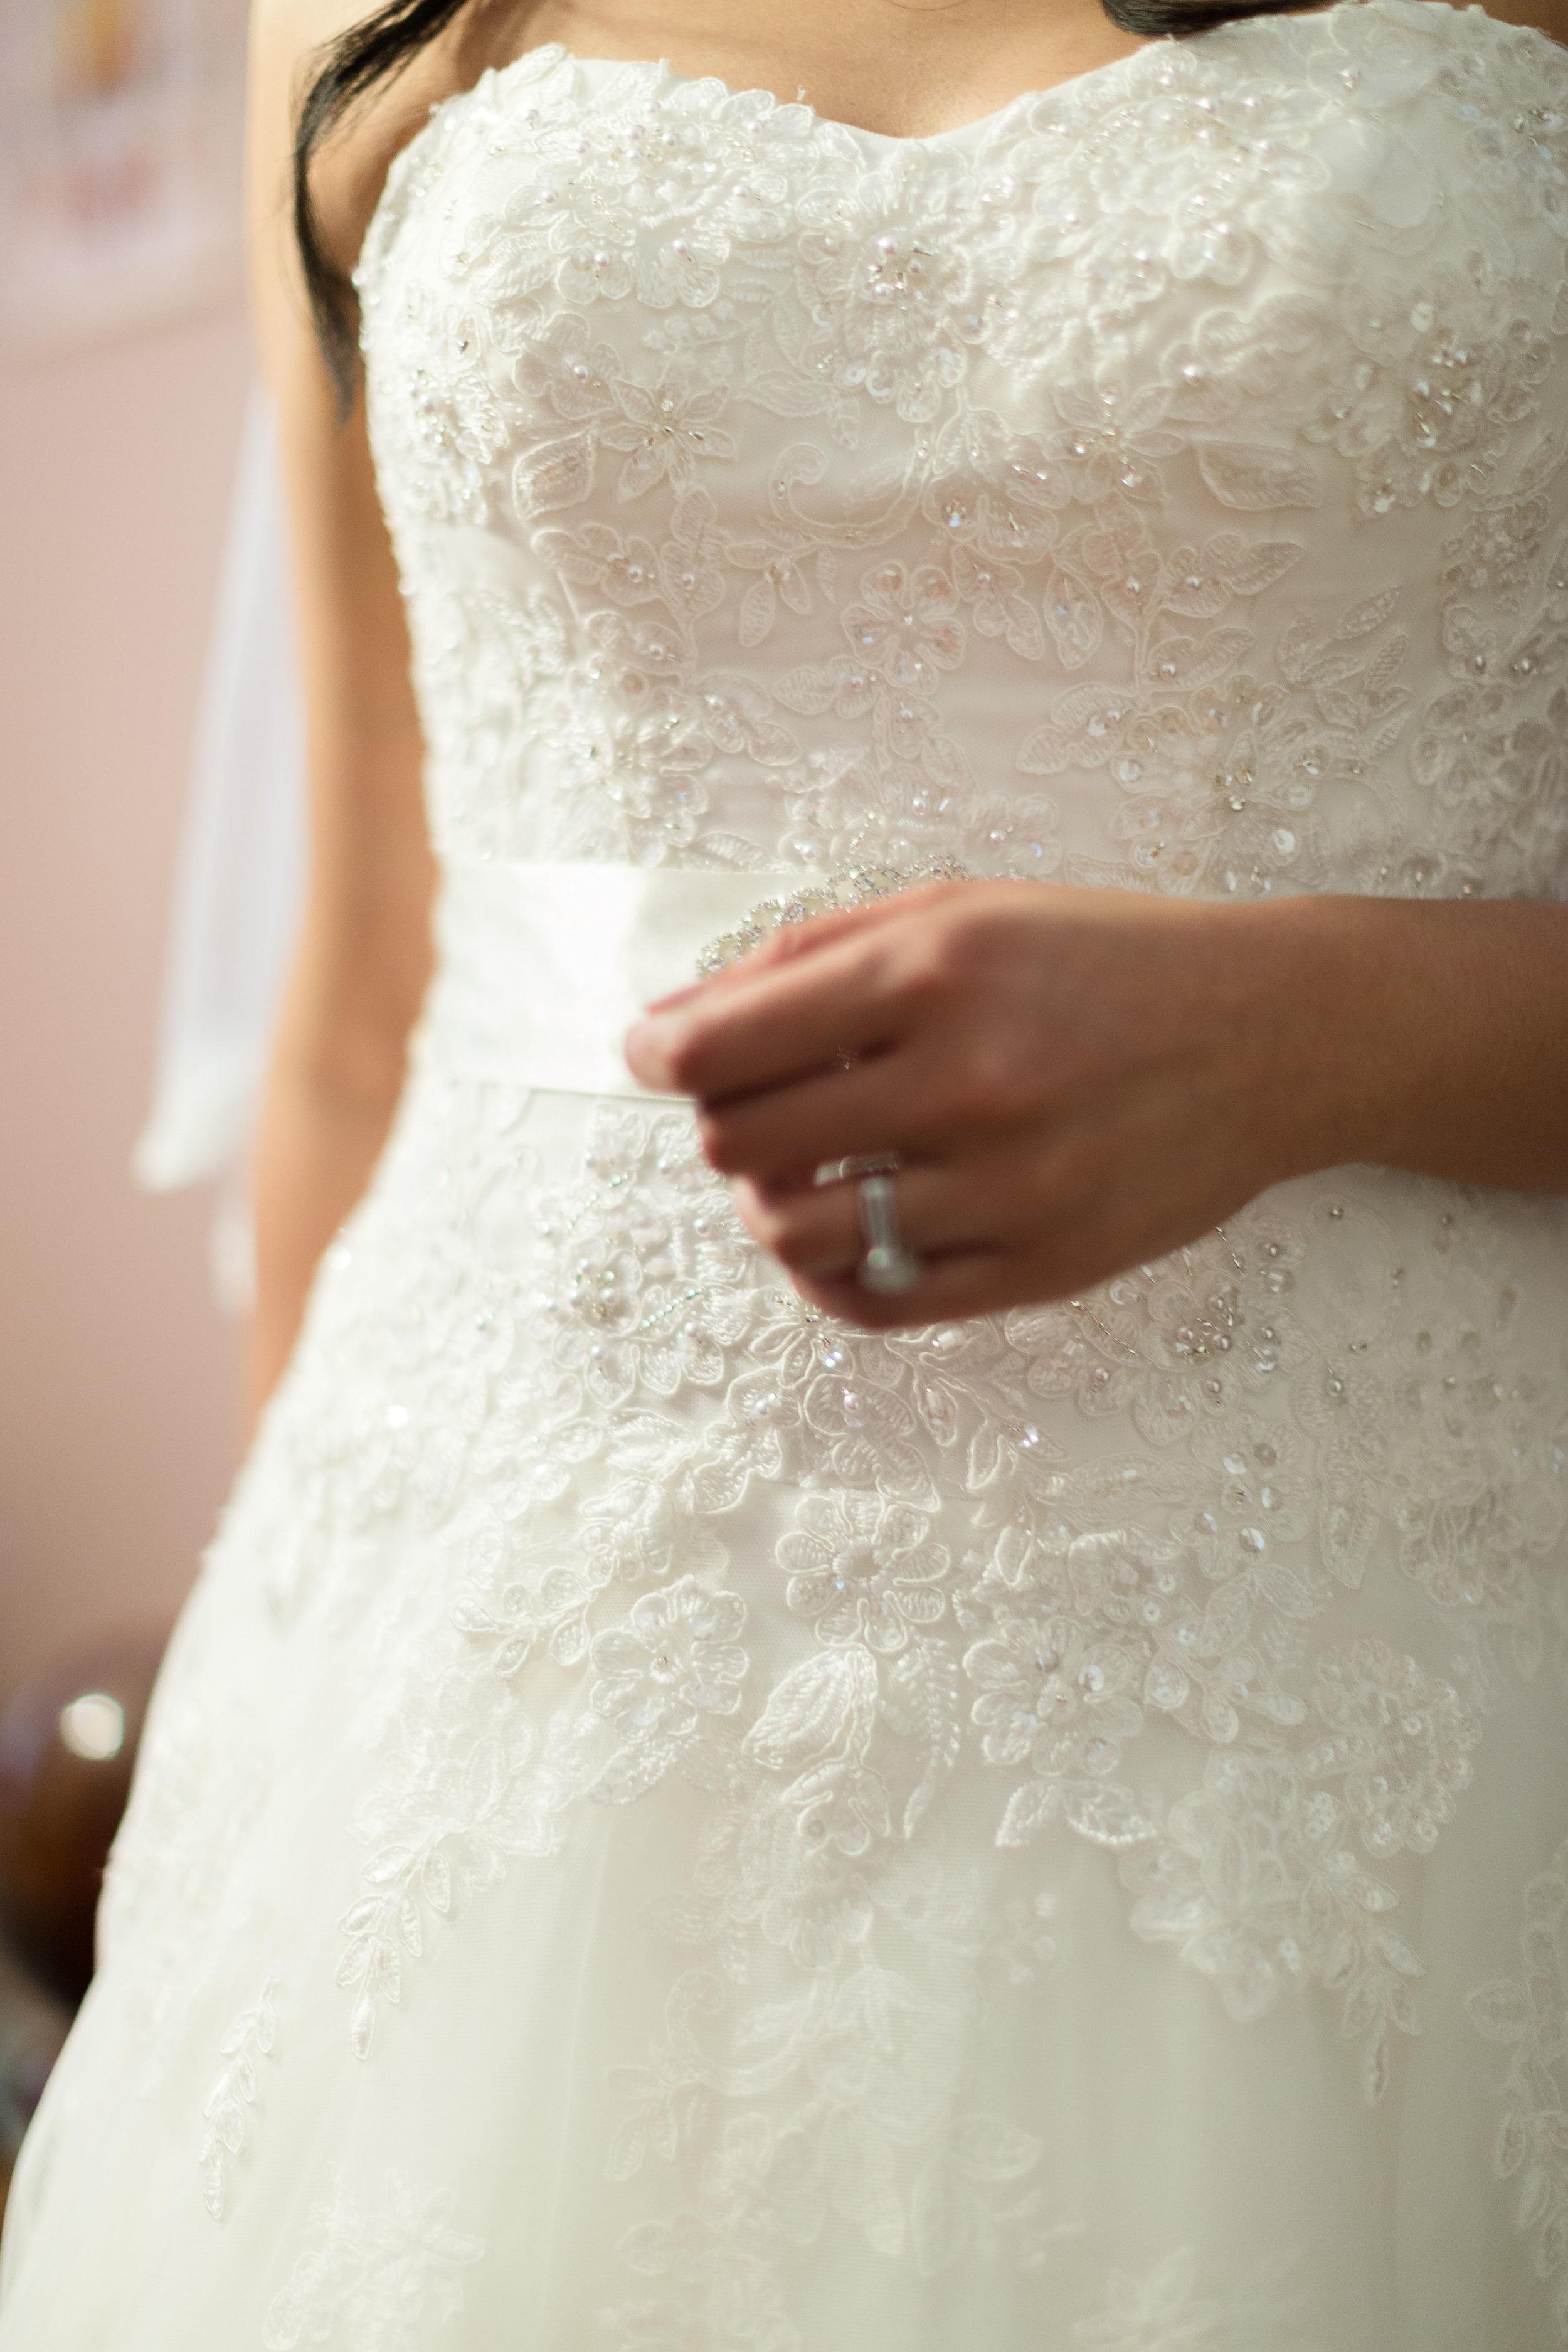 JVaughn_Photography_Weddings_Huntley_Photographer_Professional_Wedding0360.jpg